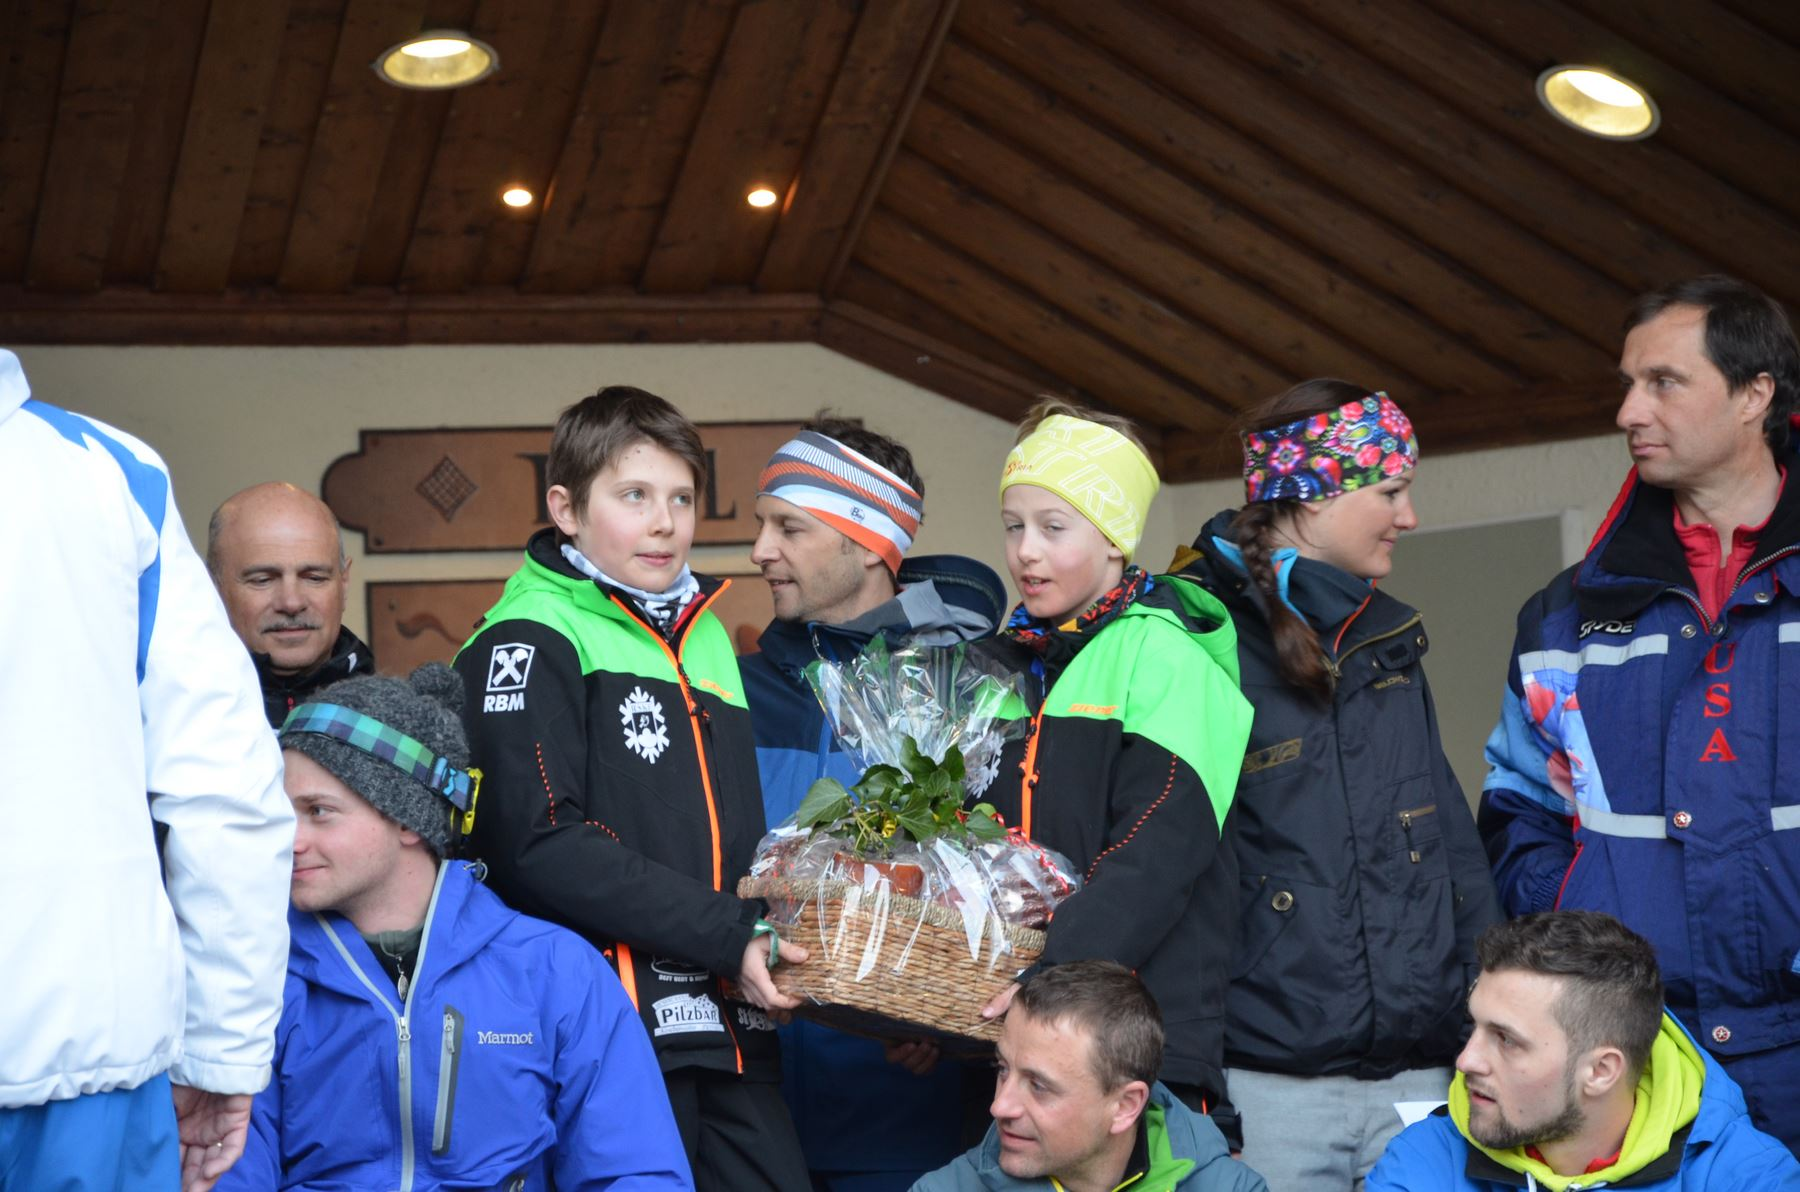 2015-03-22 BV Zillertal Skirennen 561.JPG